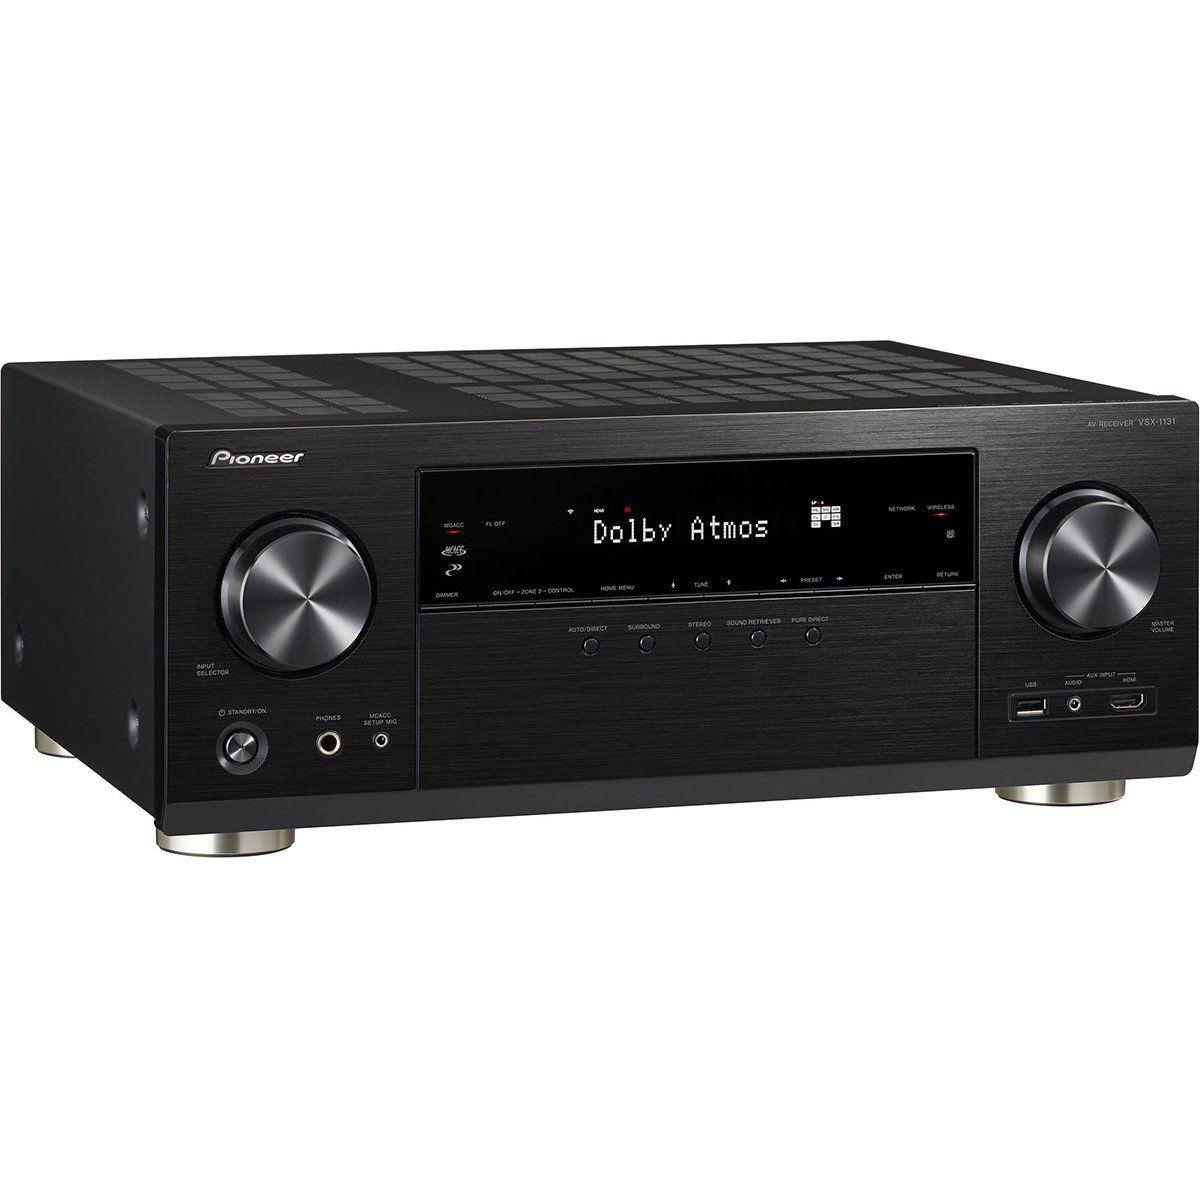 Pioneer Home VSX-1131K Receiver com Dolby Atmos 4K Wi-Fi para Home Theater